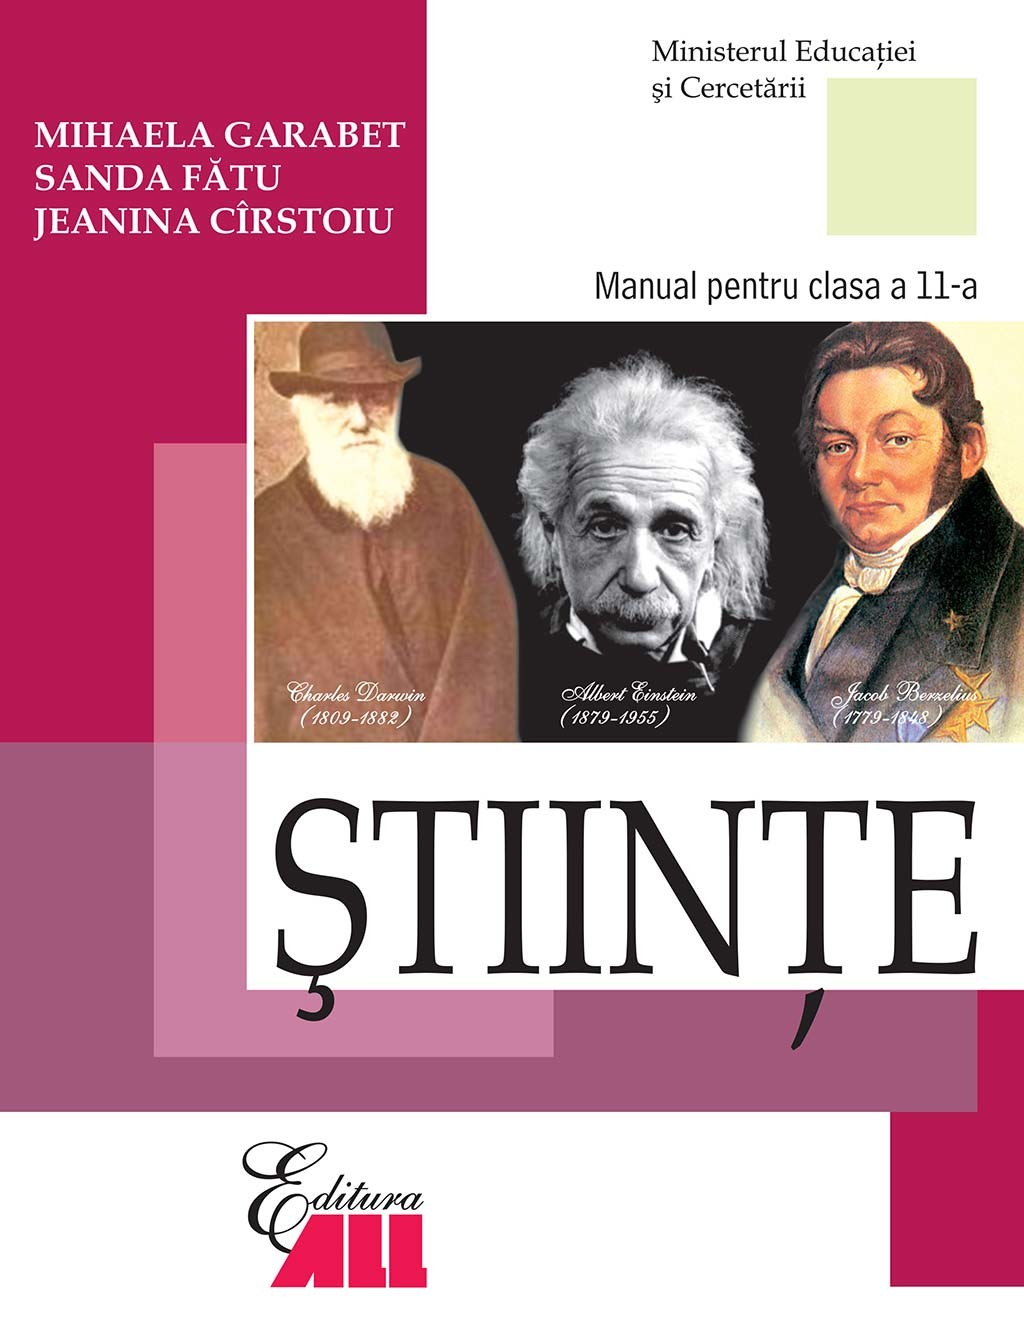 Stiinte. Manual pentru clasa a 11-a (eBook) pdf pret librarie elefant oferta